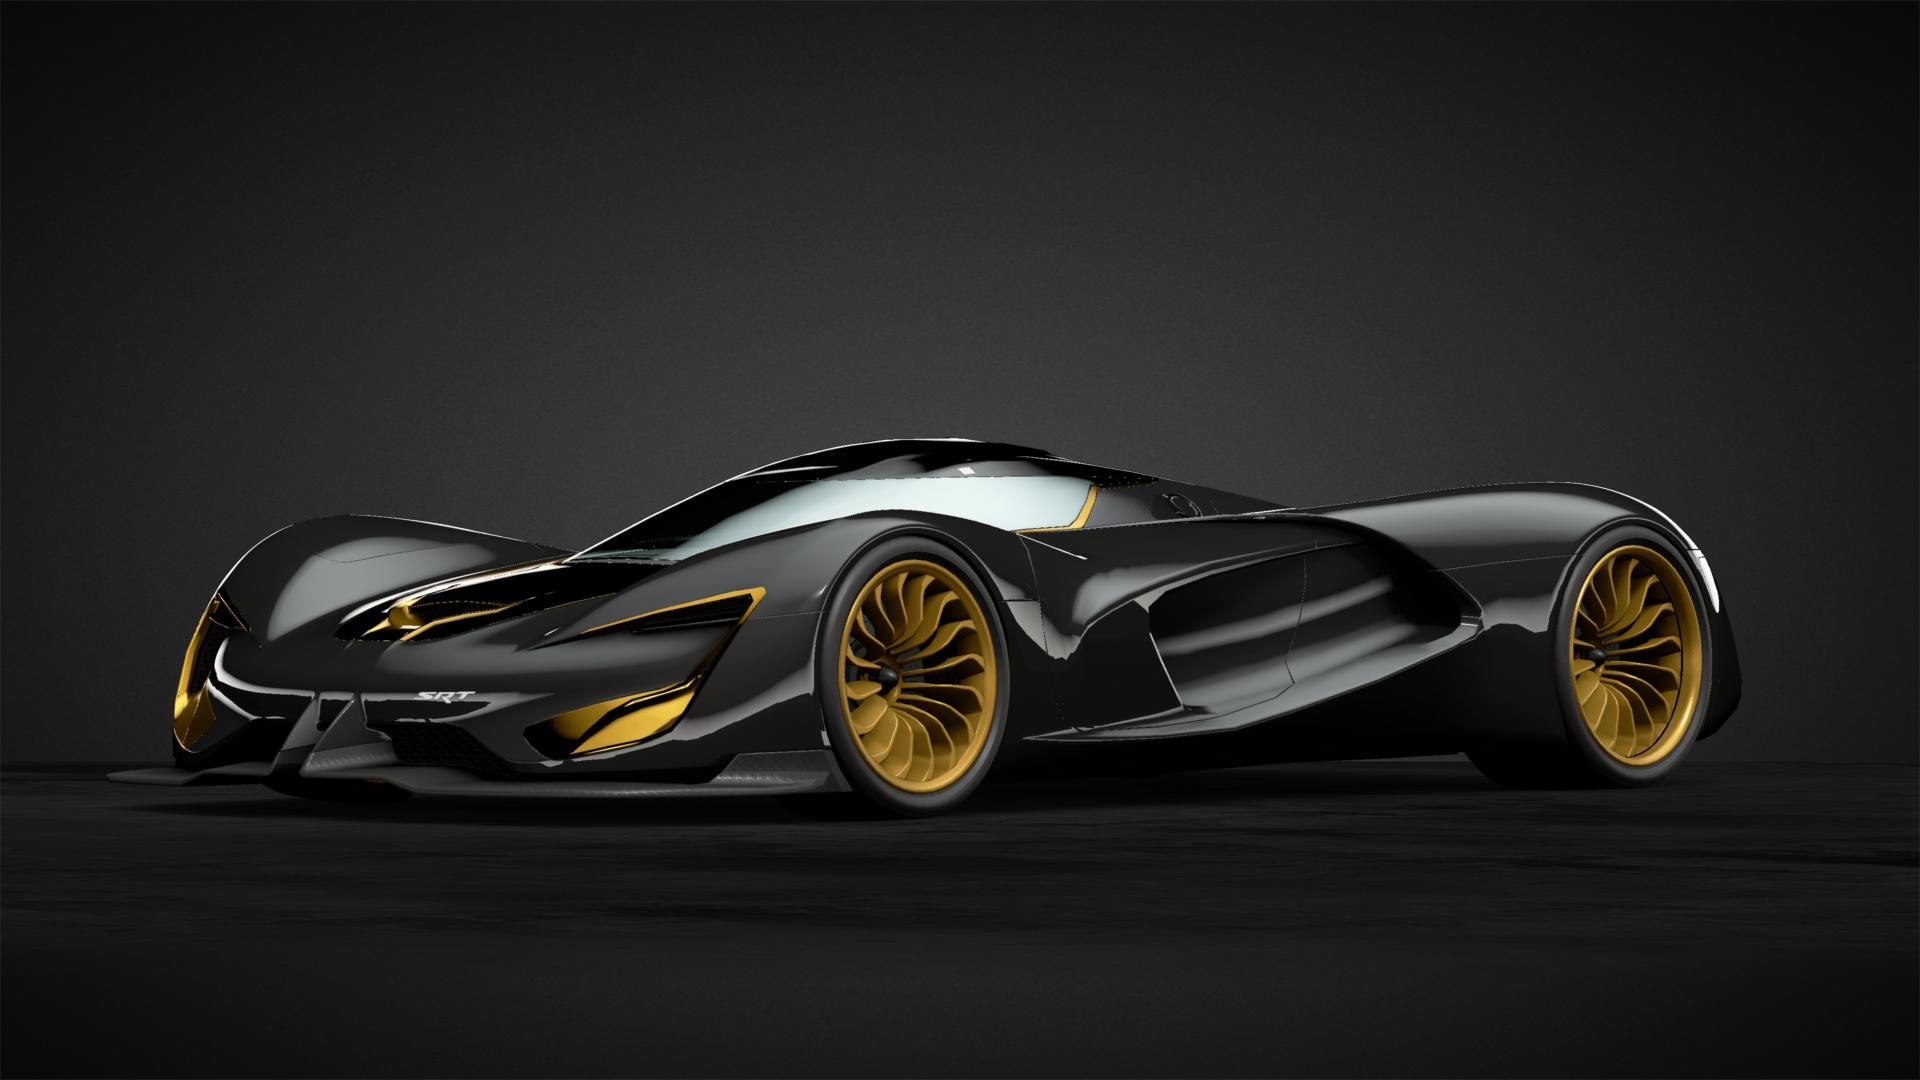 Black Gold Car Livery By Mf Pennzoil Community Gran Turismo Sport